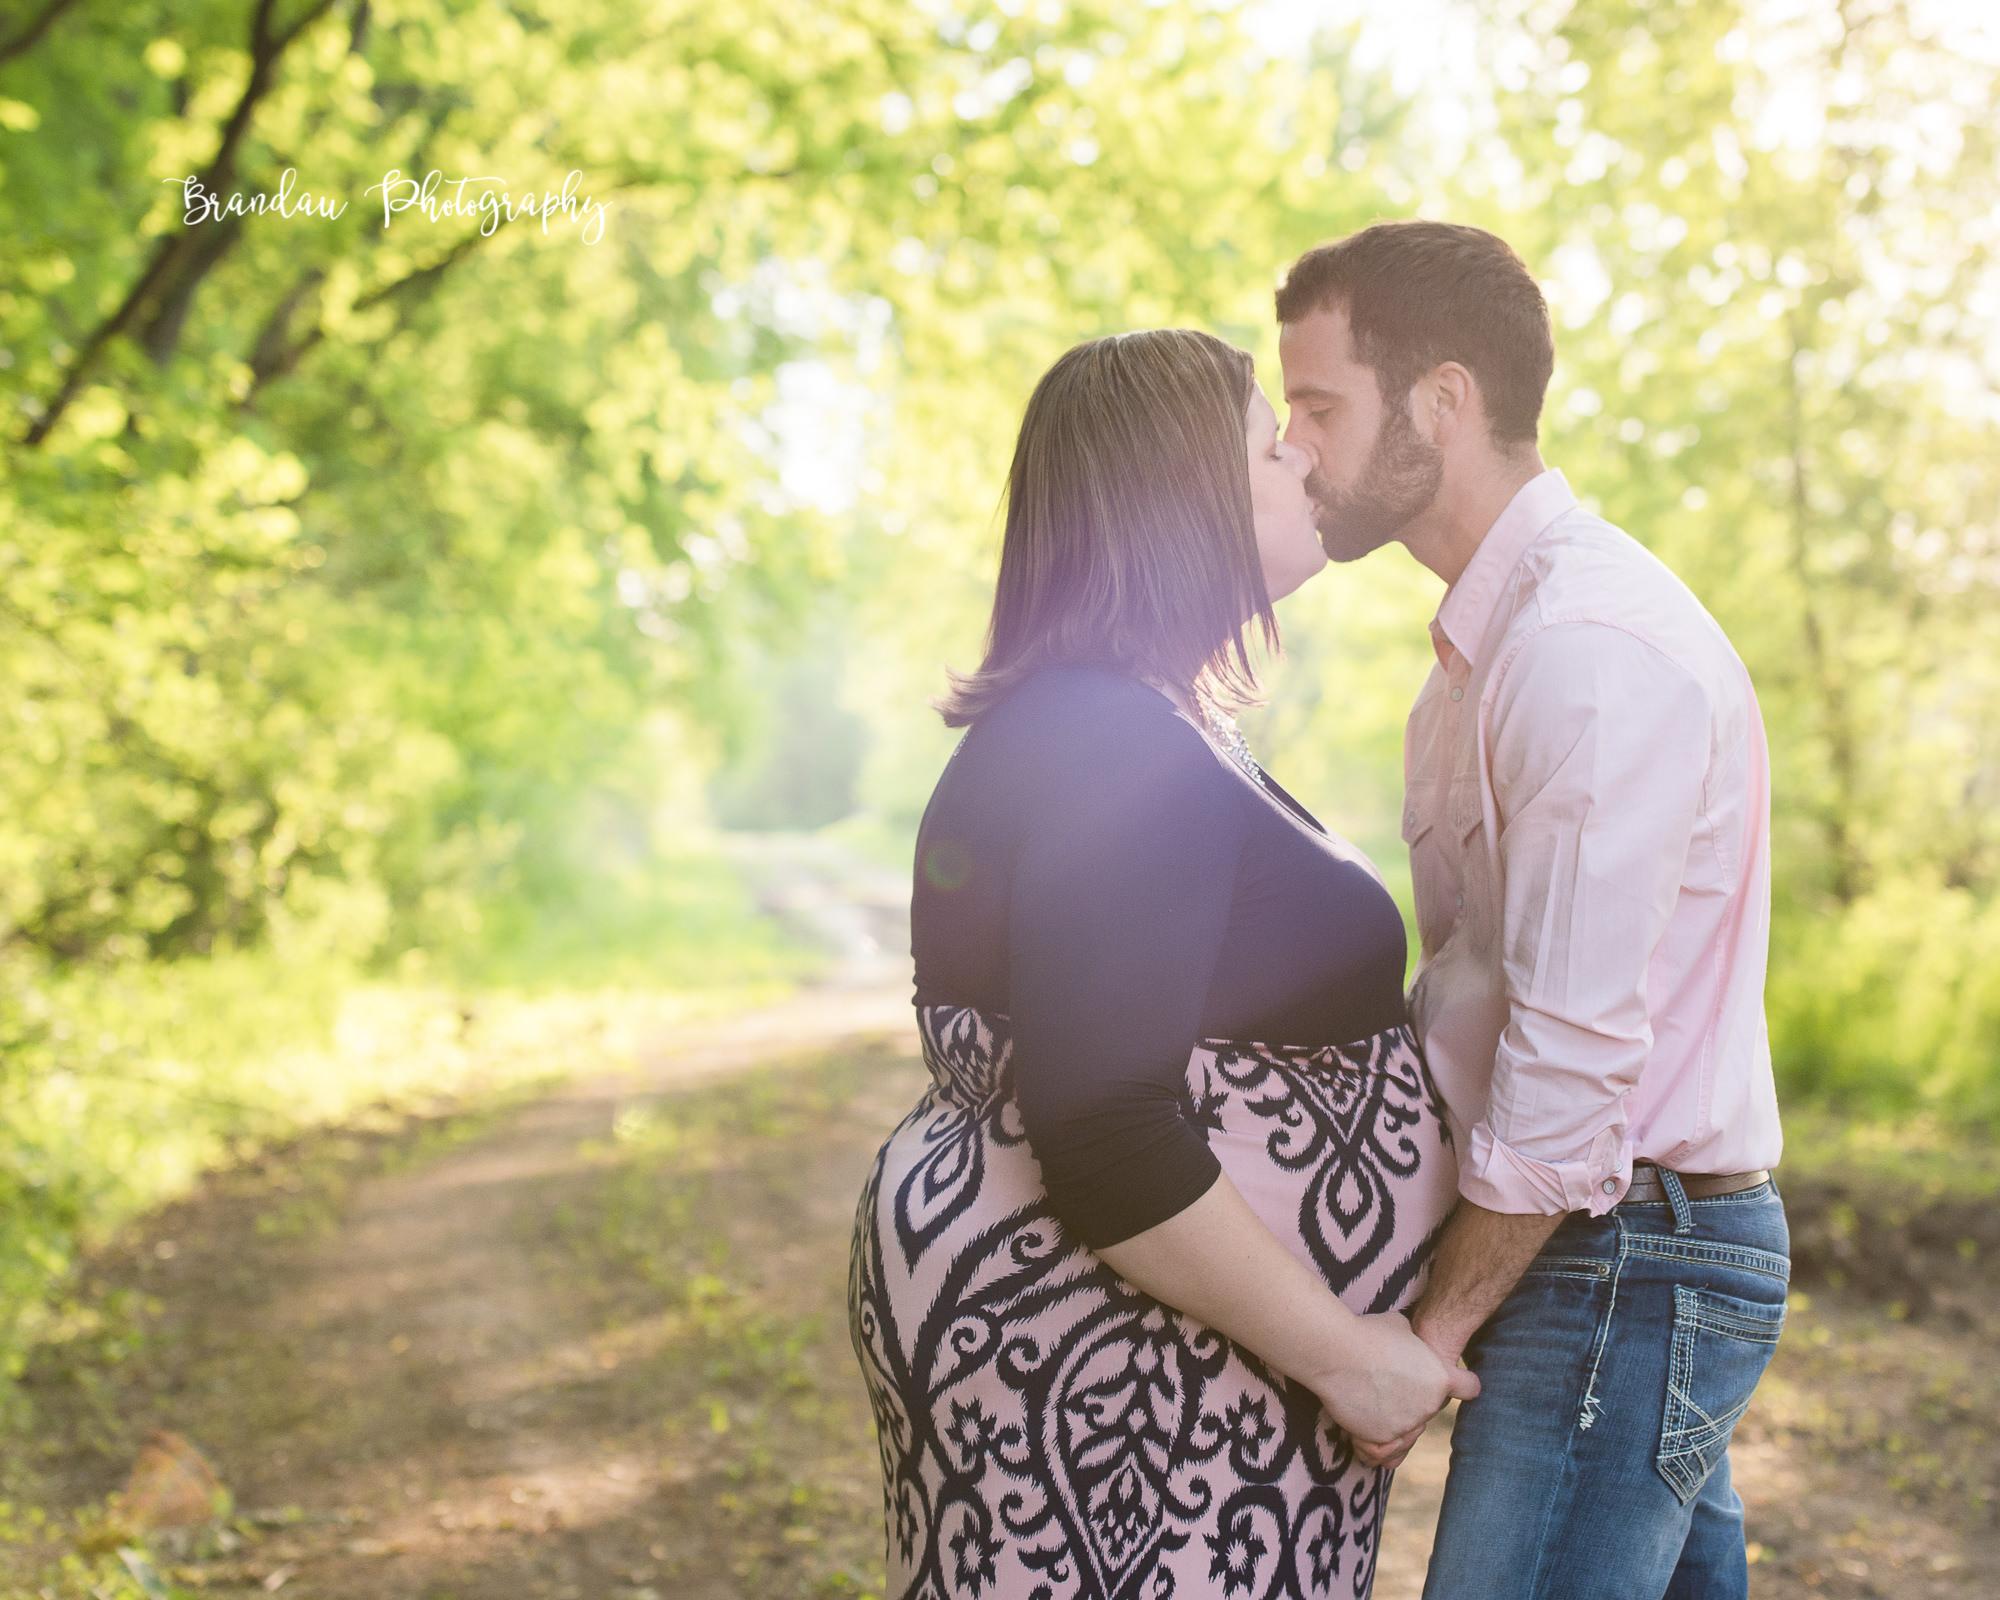 Engagement Kissing_Brandau Photography-15.jpg